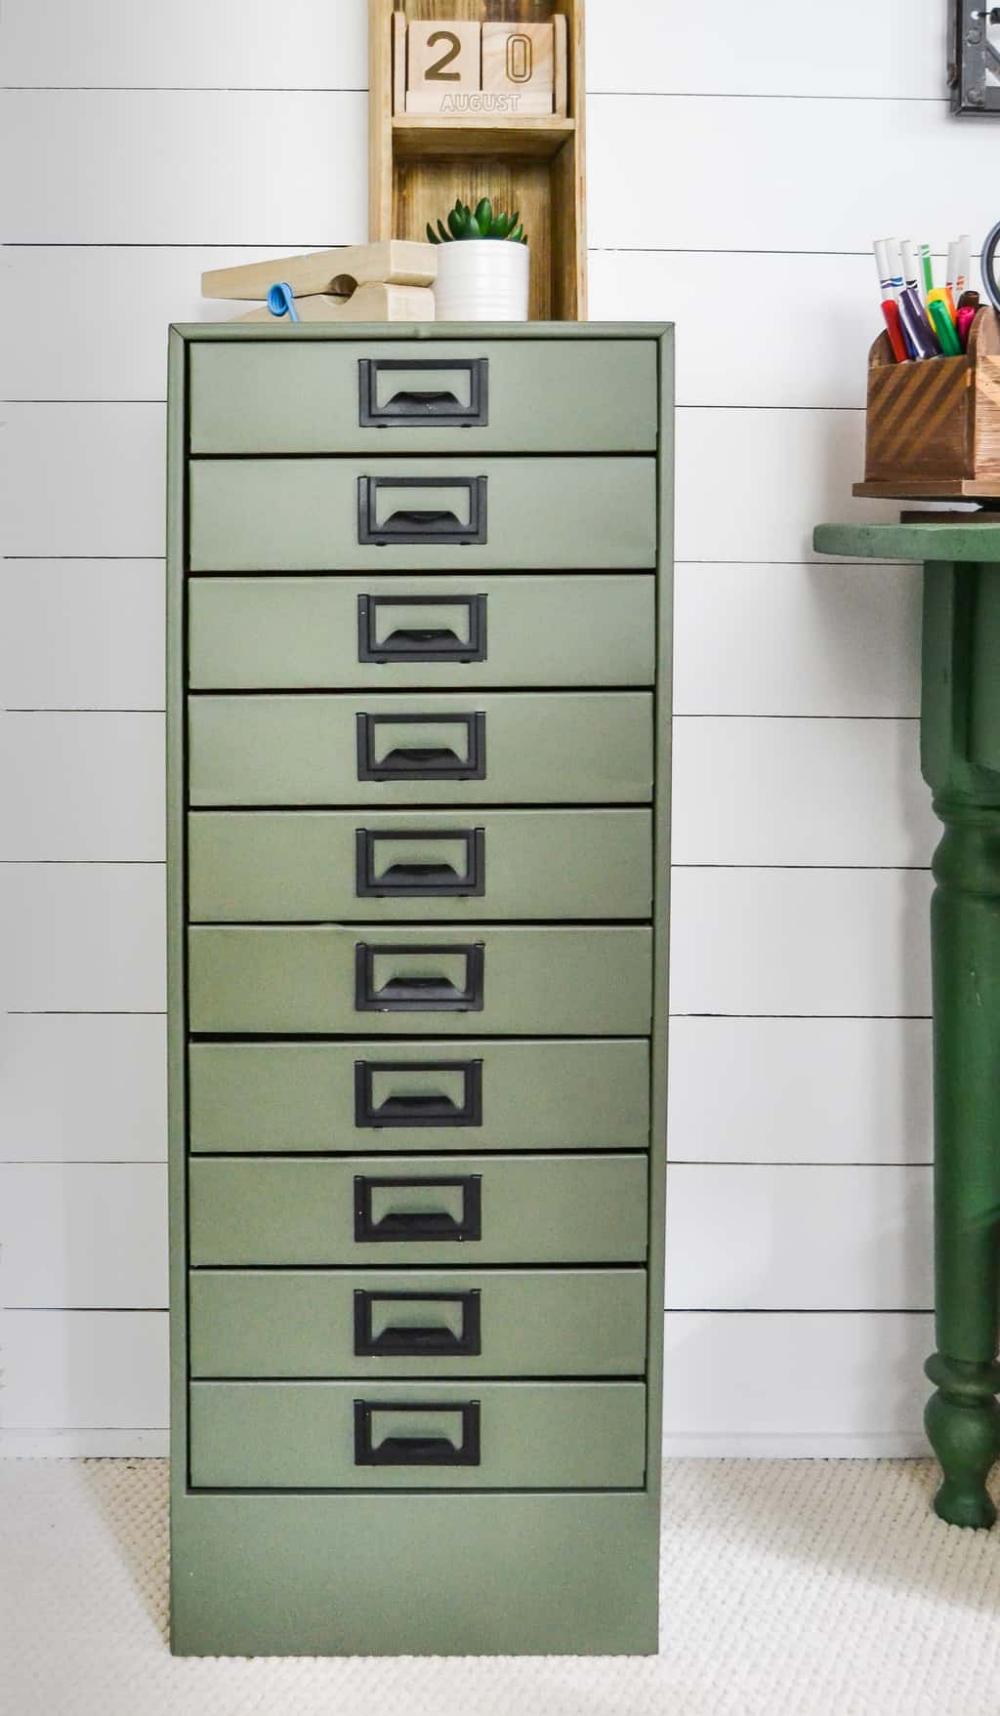 DIY Metal Cabinet Makeover With Paint | Metal storage ...